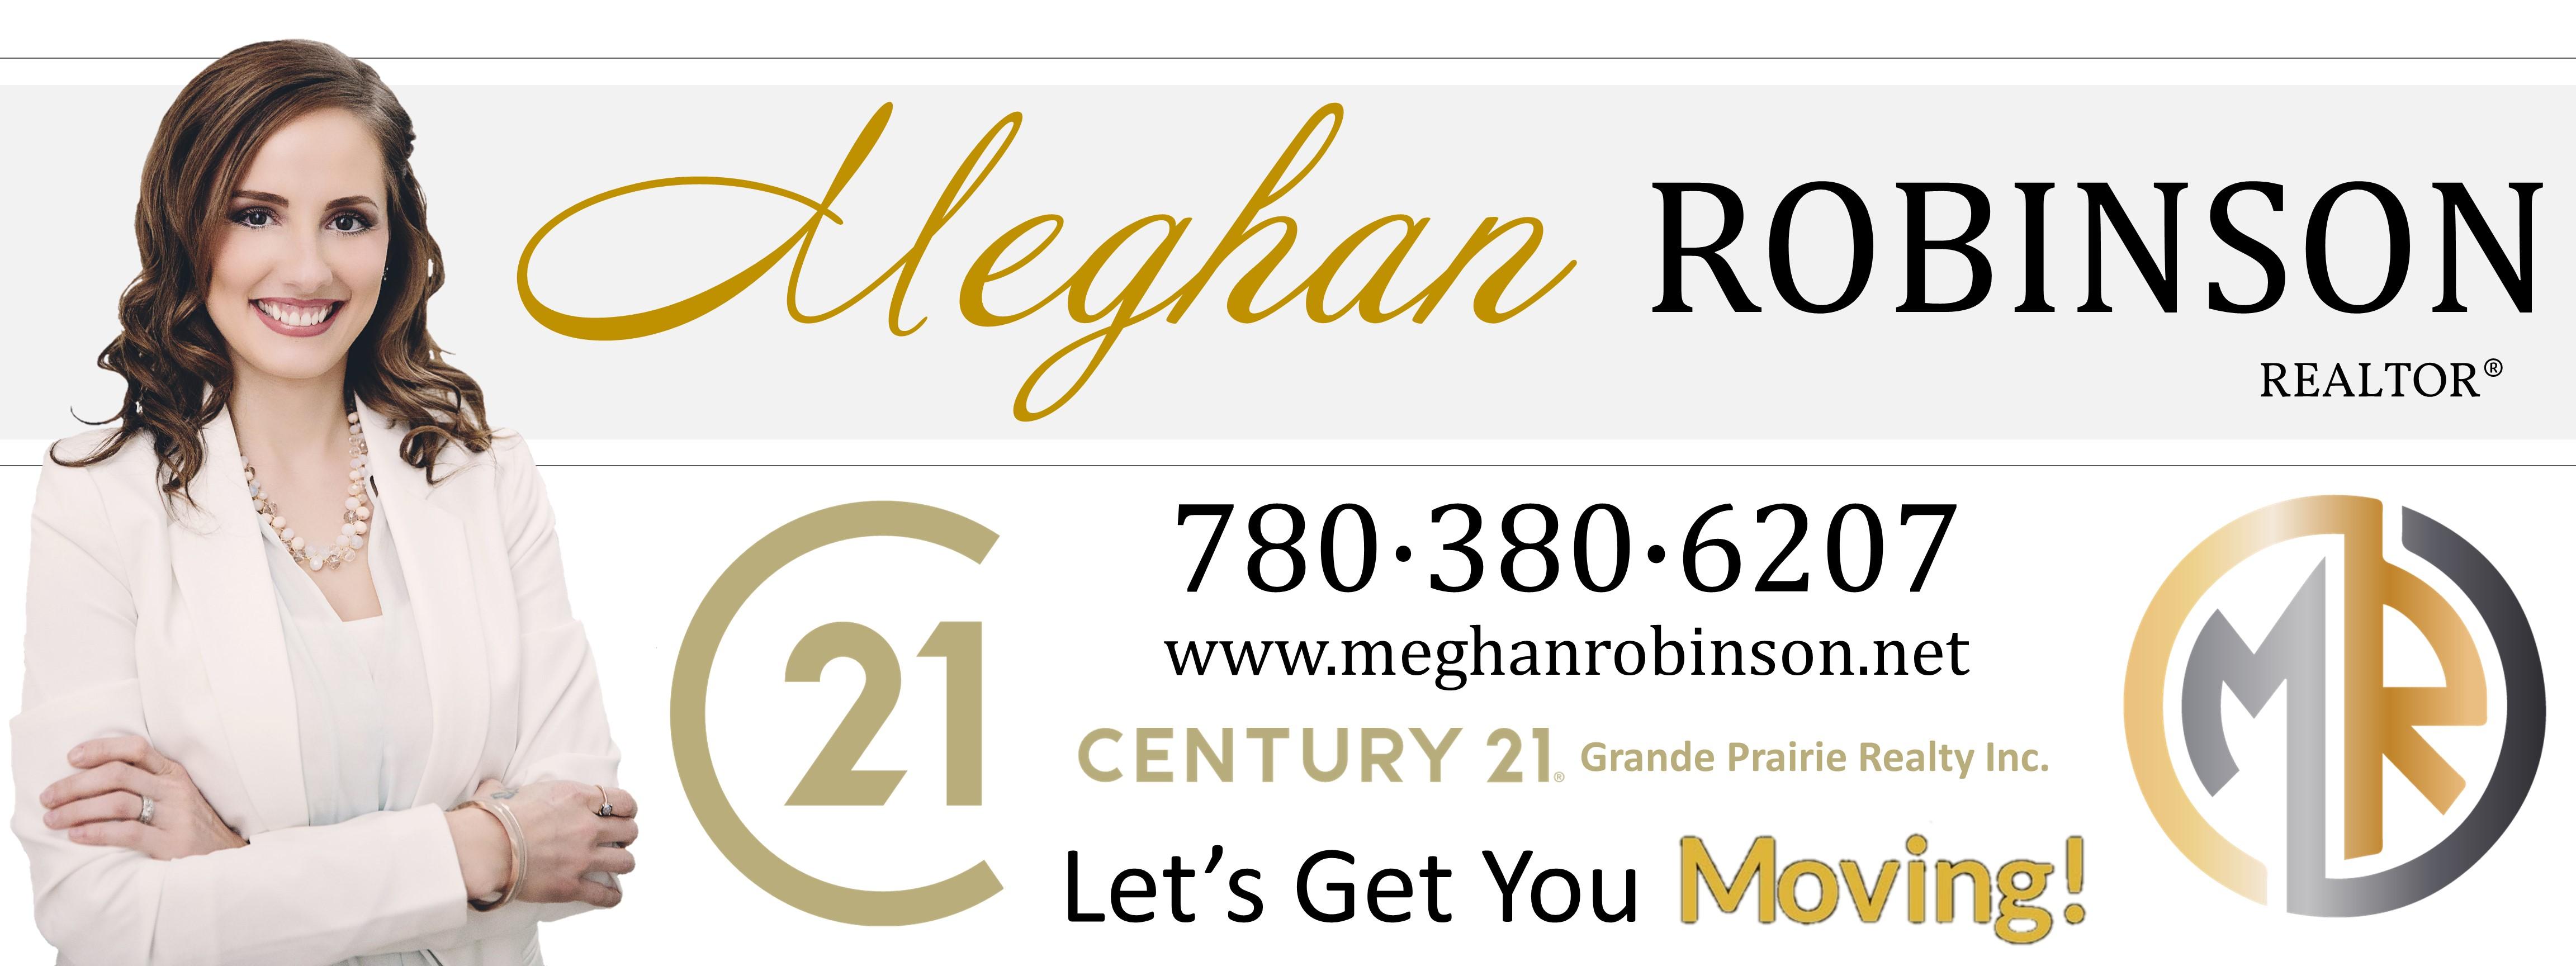 Meghan Robinson - Realtor in Grande Prairie, AB